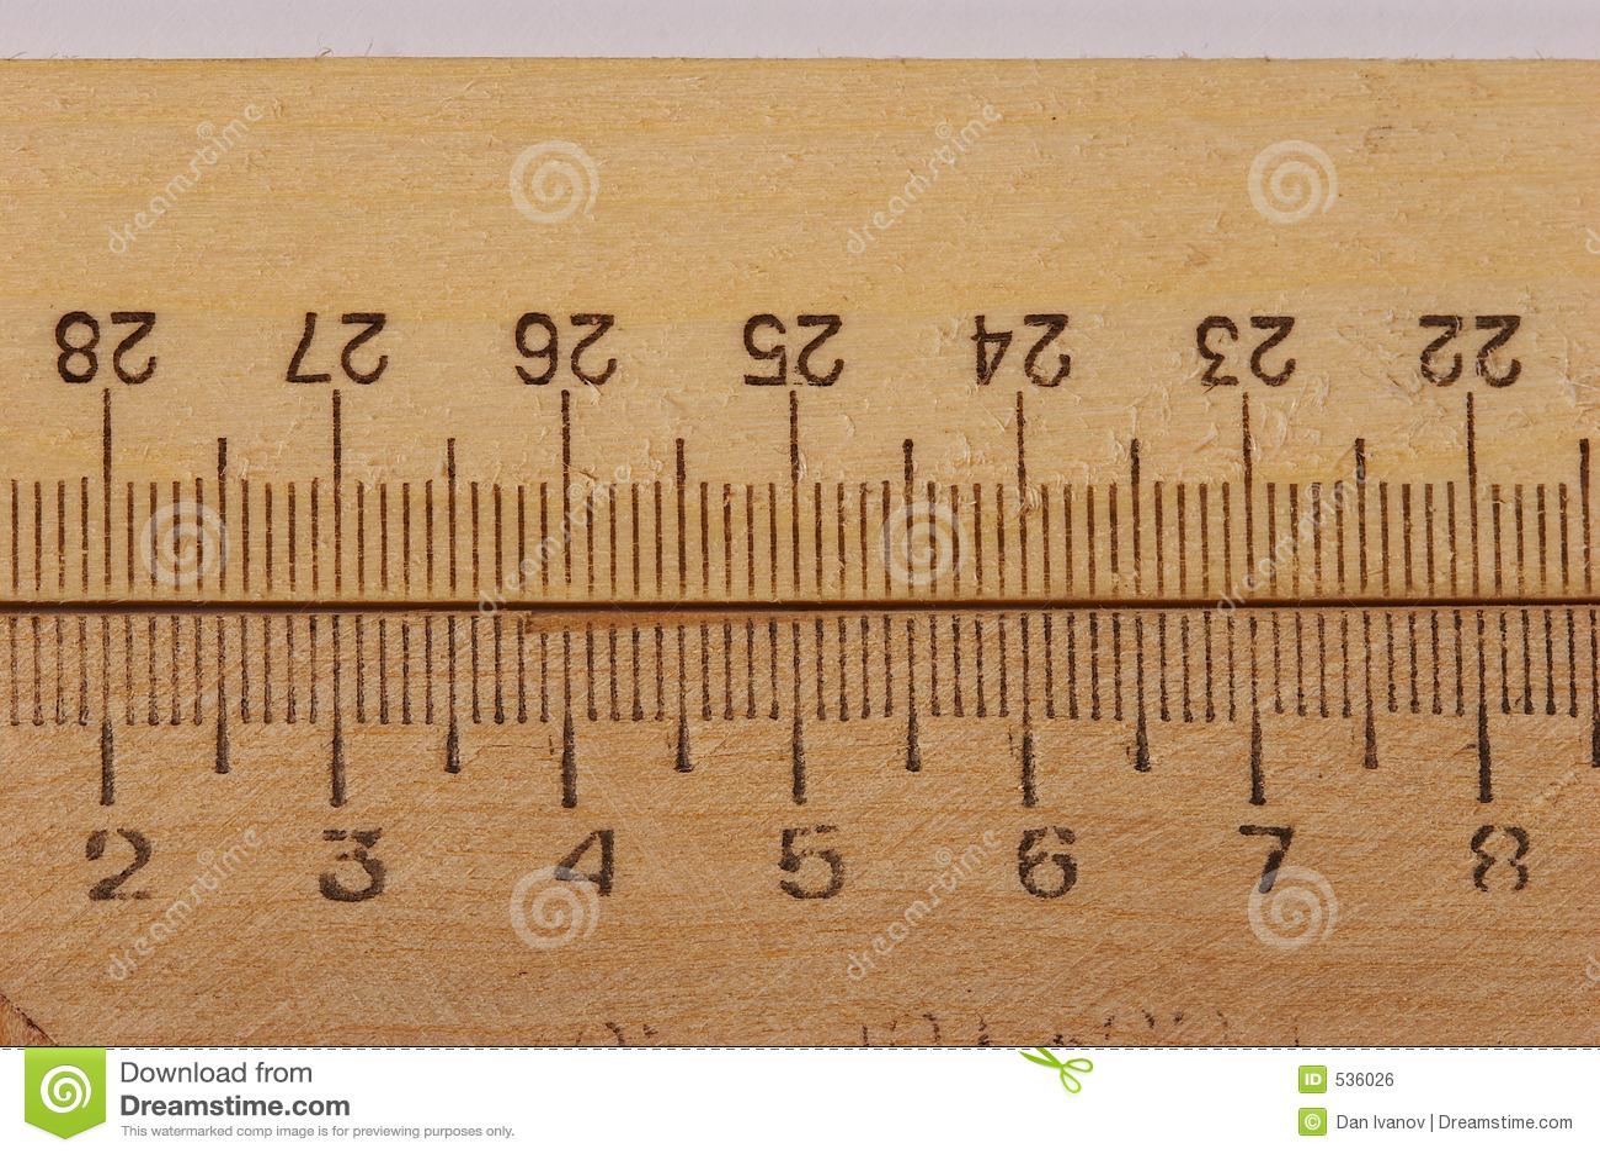 Download 统治者 库存照片. 图片 包括有 水平, 国际, 用品, 概念, 商业, 编号, 英寸, 直尺, 学校, 概念性 - 536026